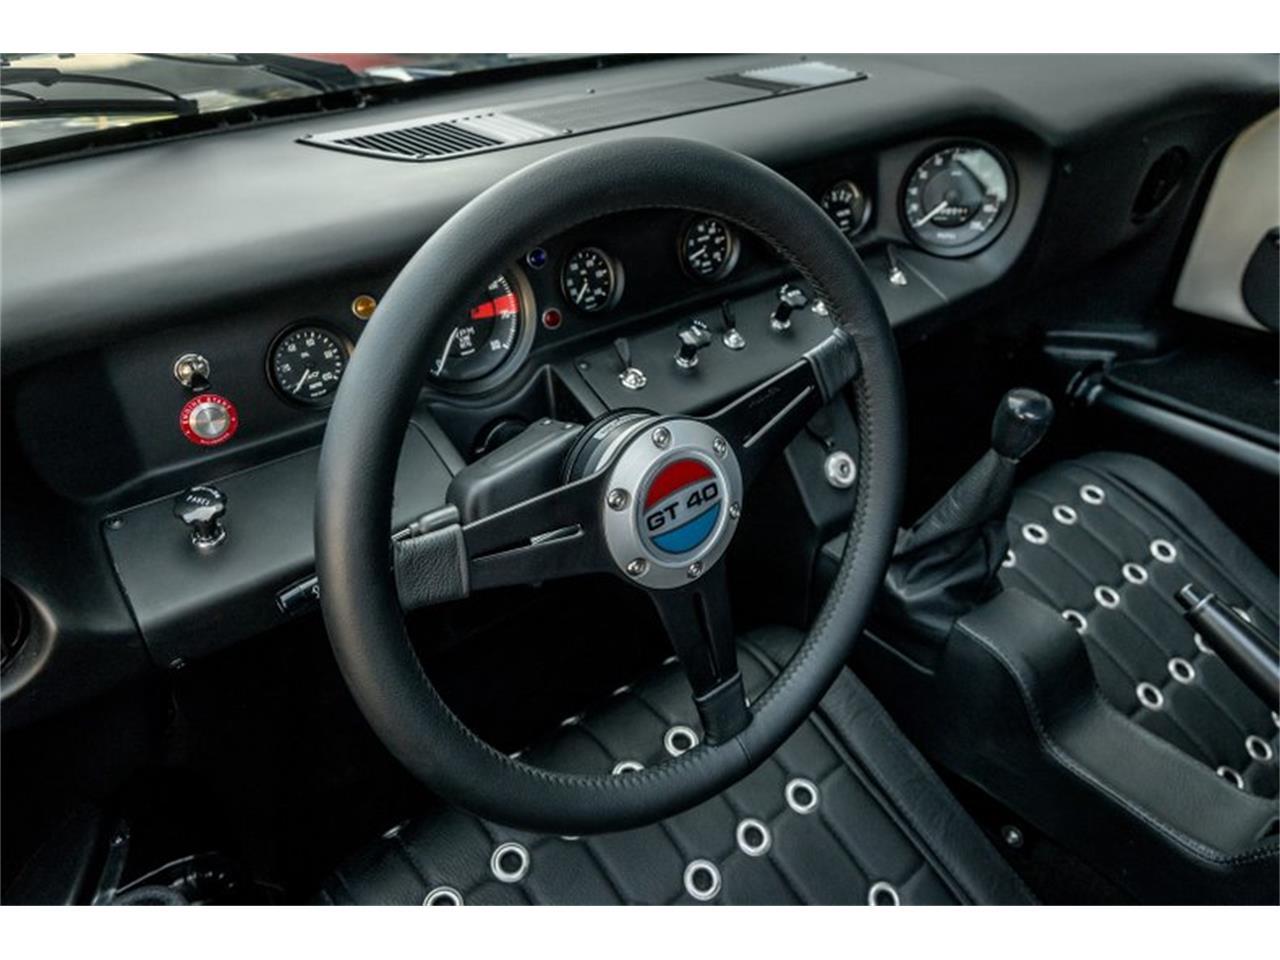 1969 Ford GT40 Mk I (CC-1305449) for sale in Irvine, California